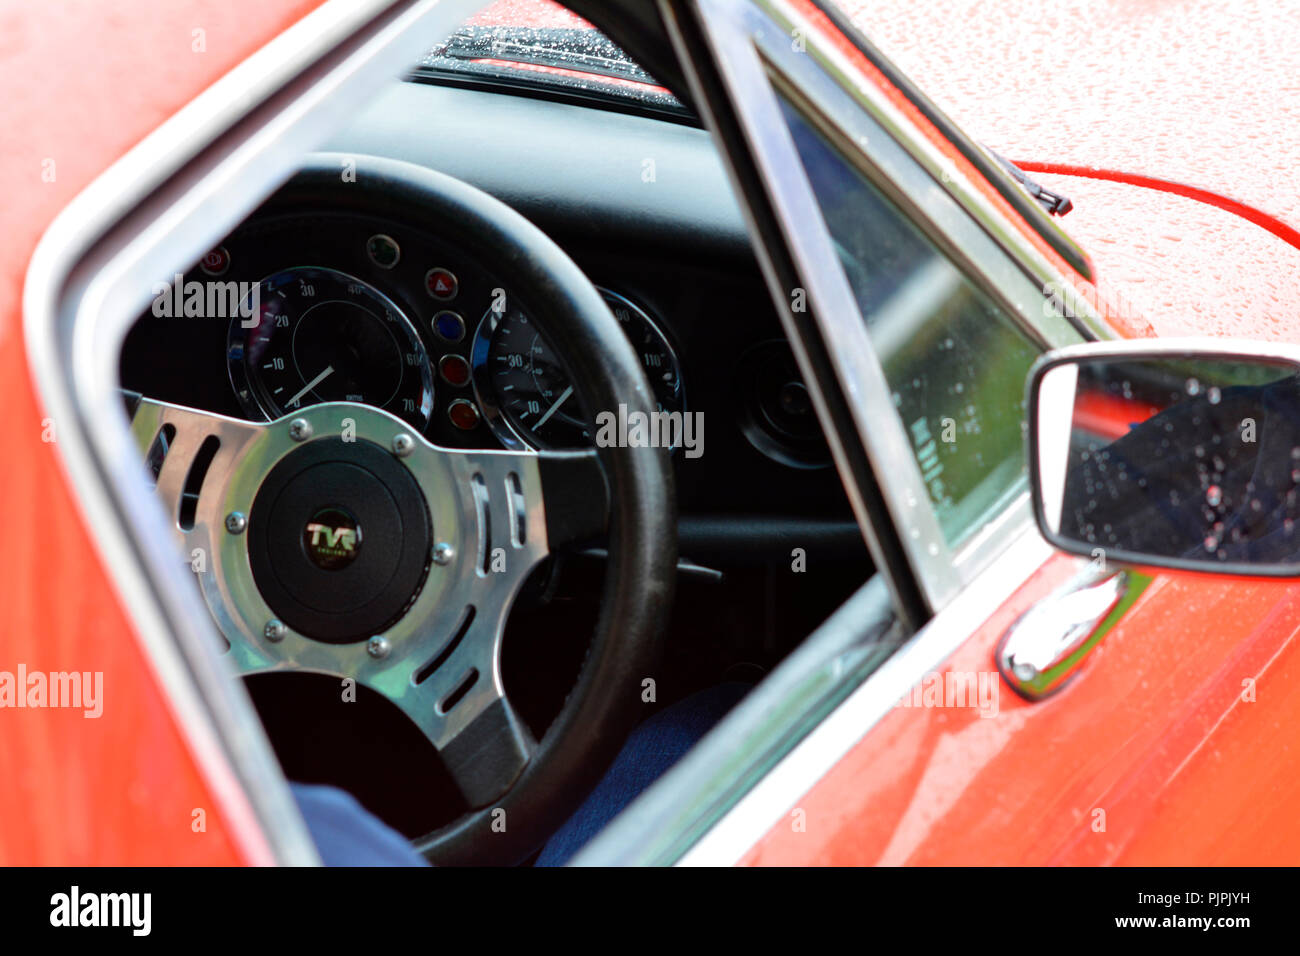 Classic TVR Tamar British sports car - Stock Image